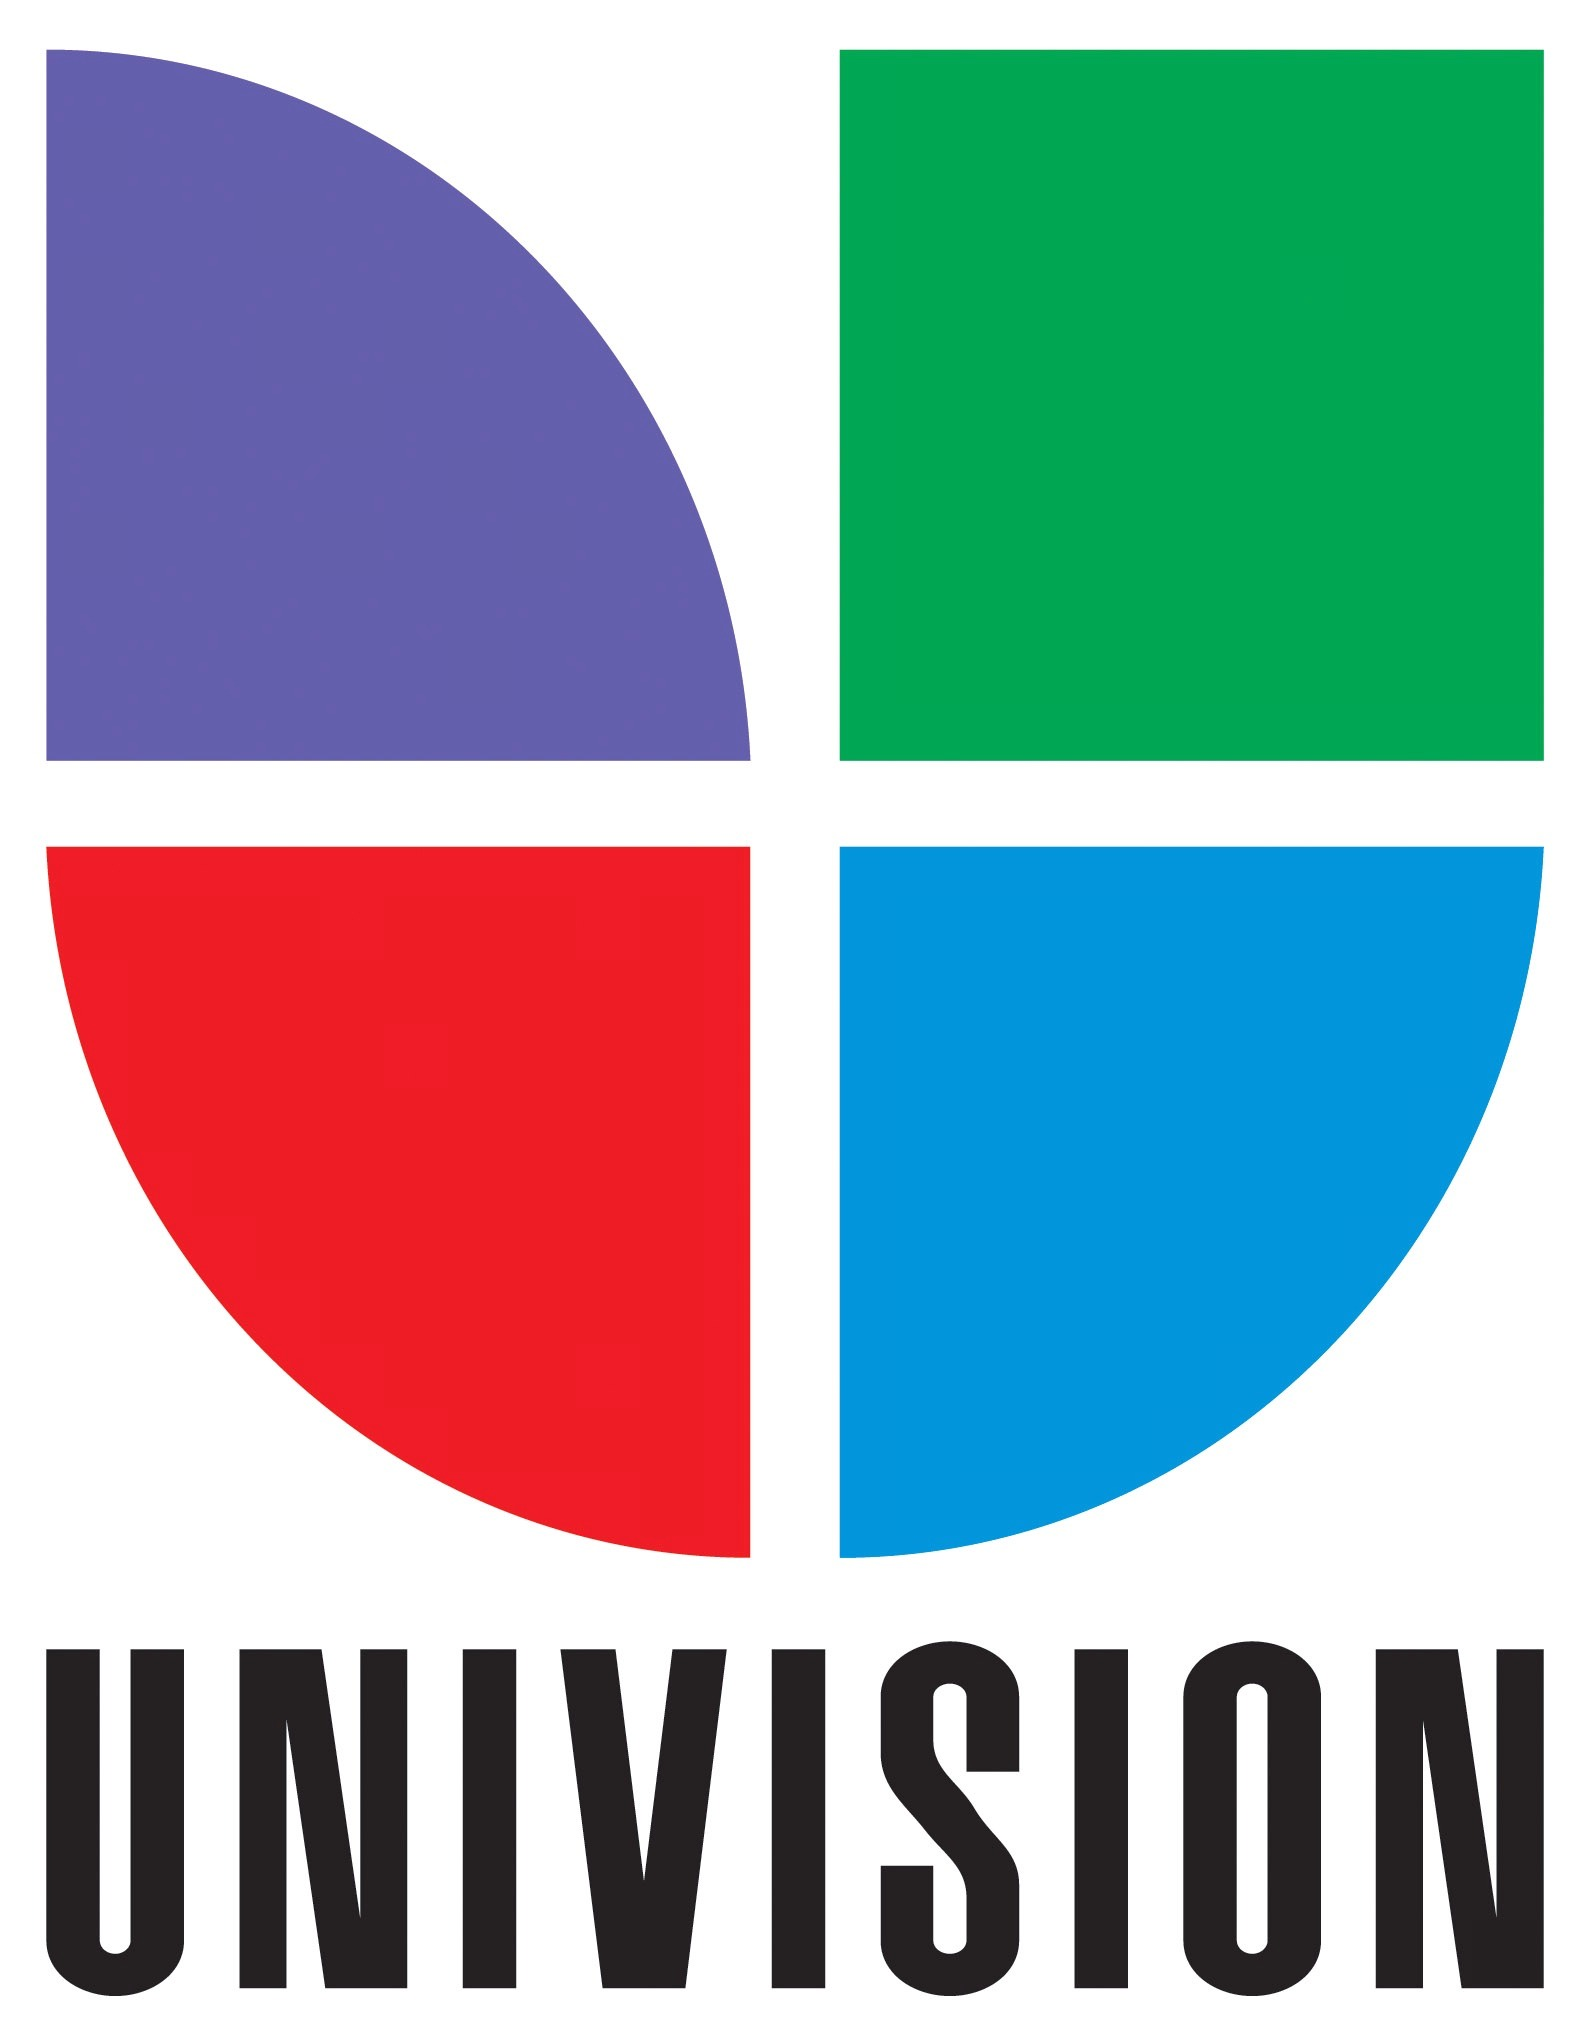 Univision2.jpg